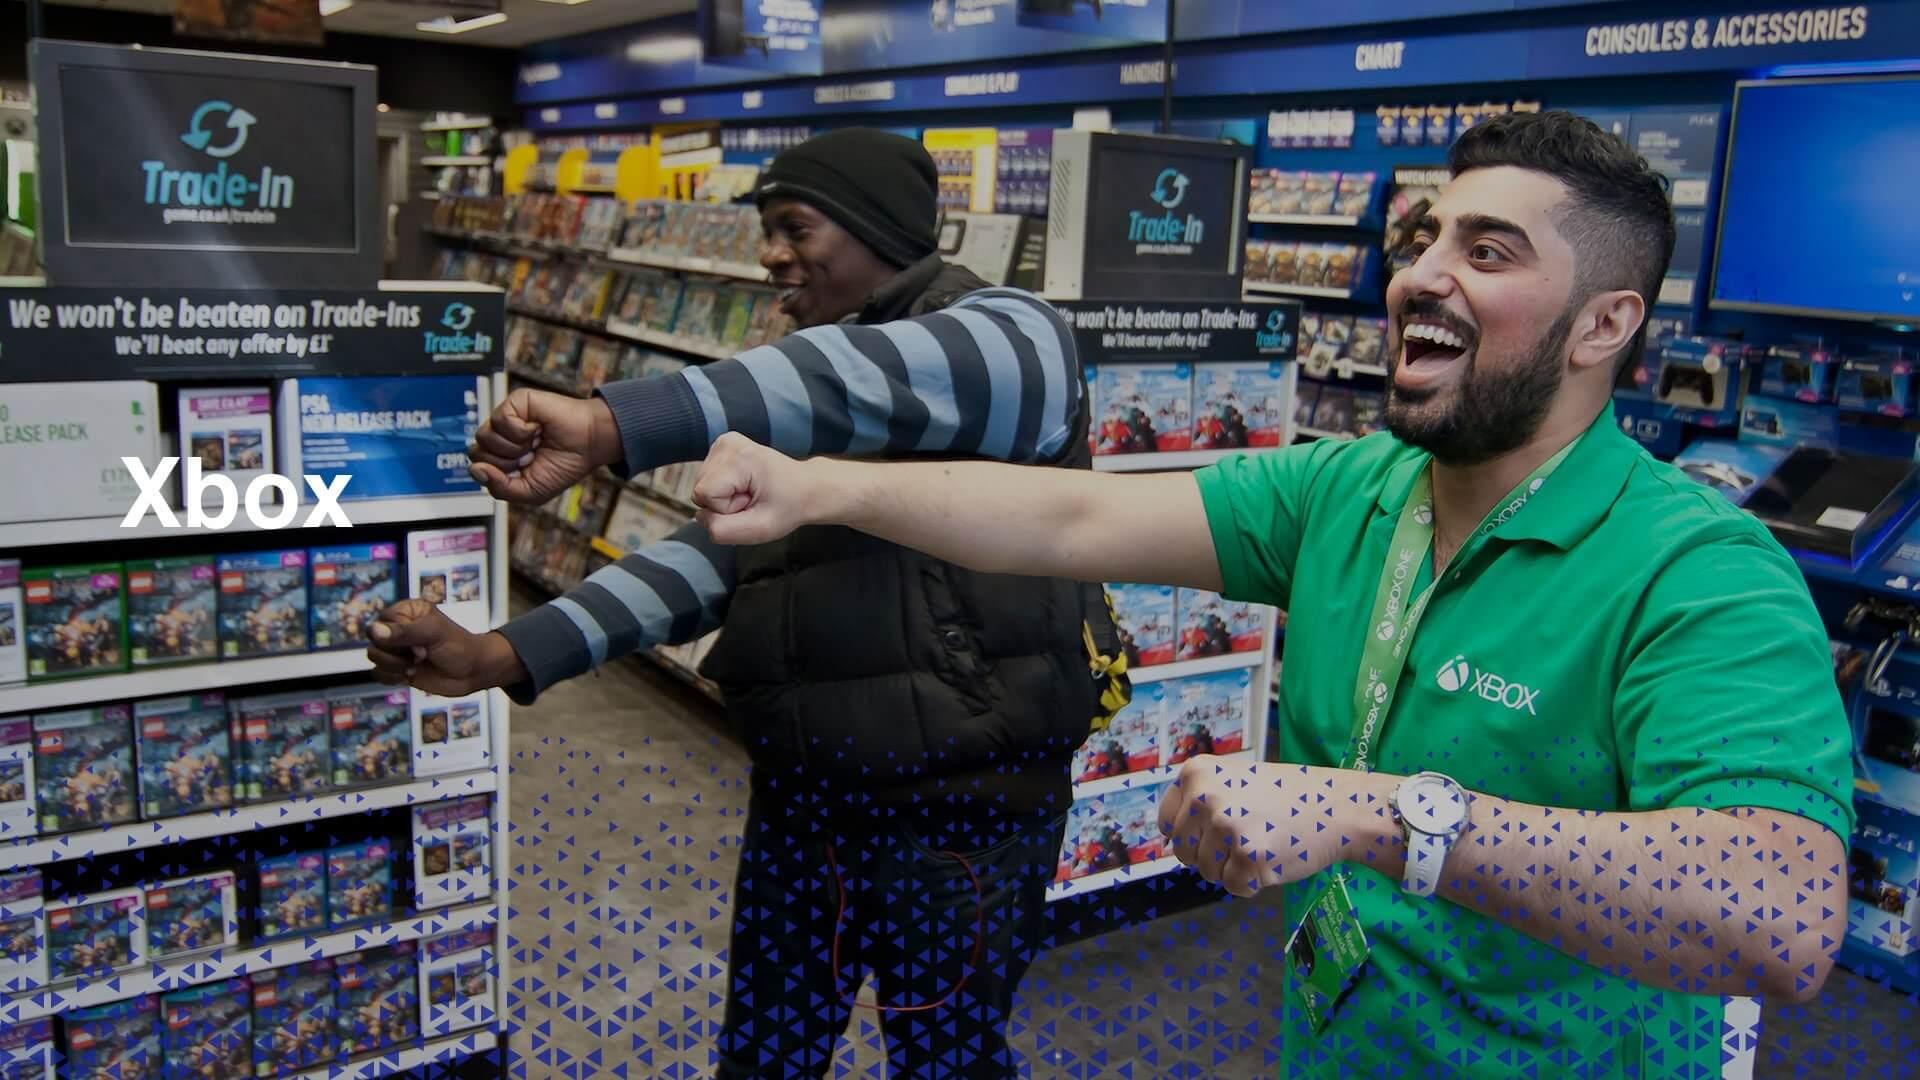 Xbox retail sales ambassador